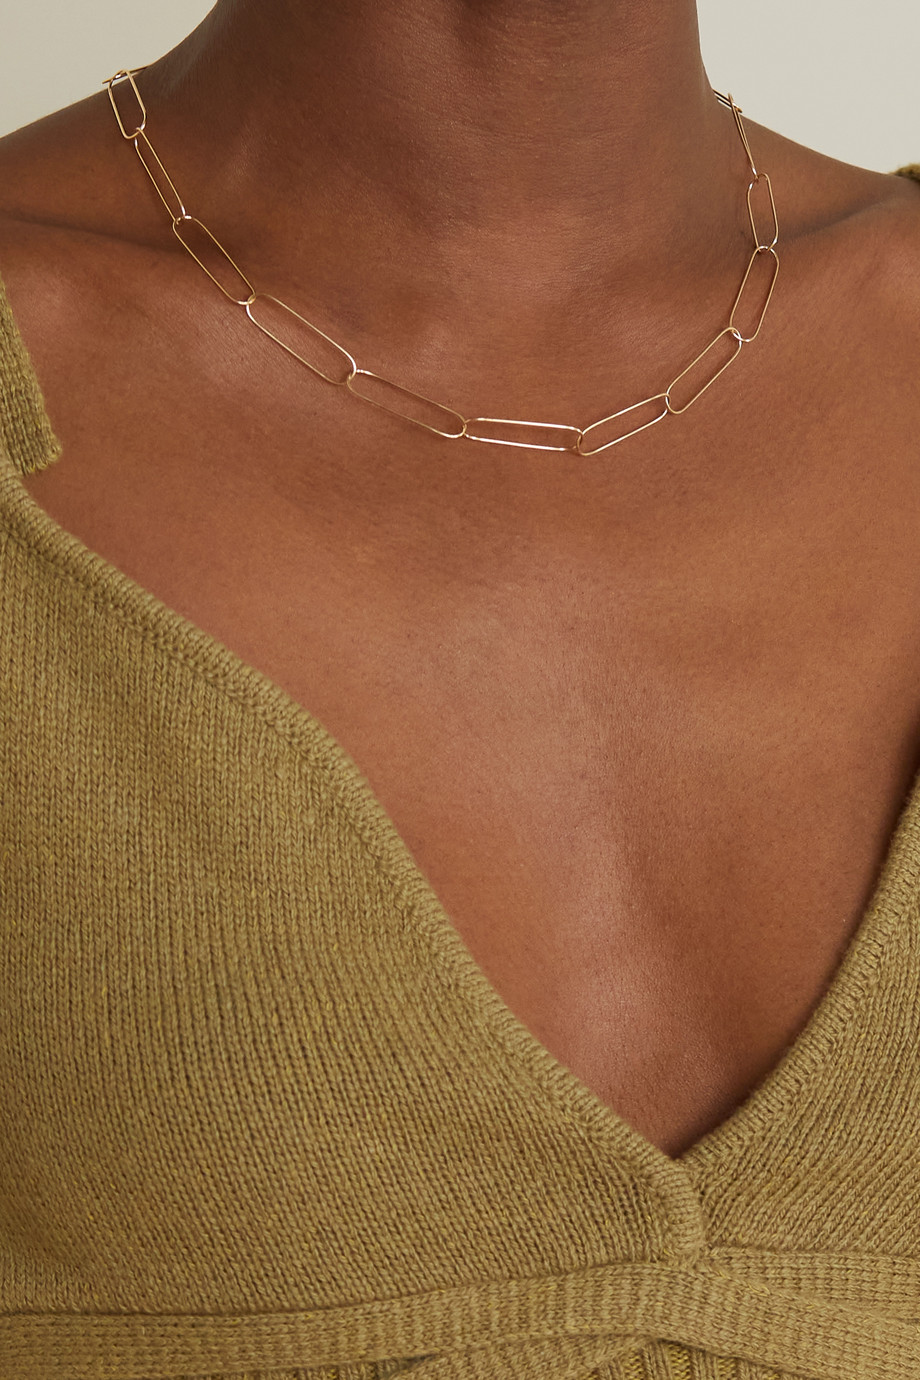 Melissa Joy Manning 14-karat recycled gold necklace